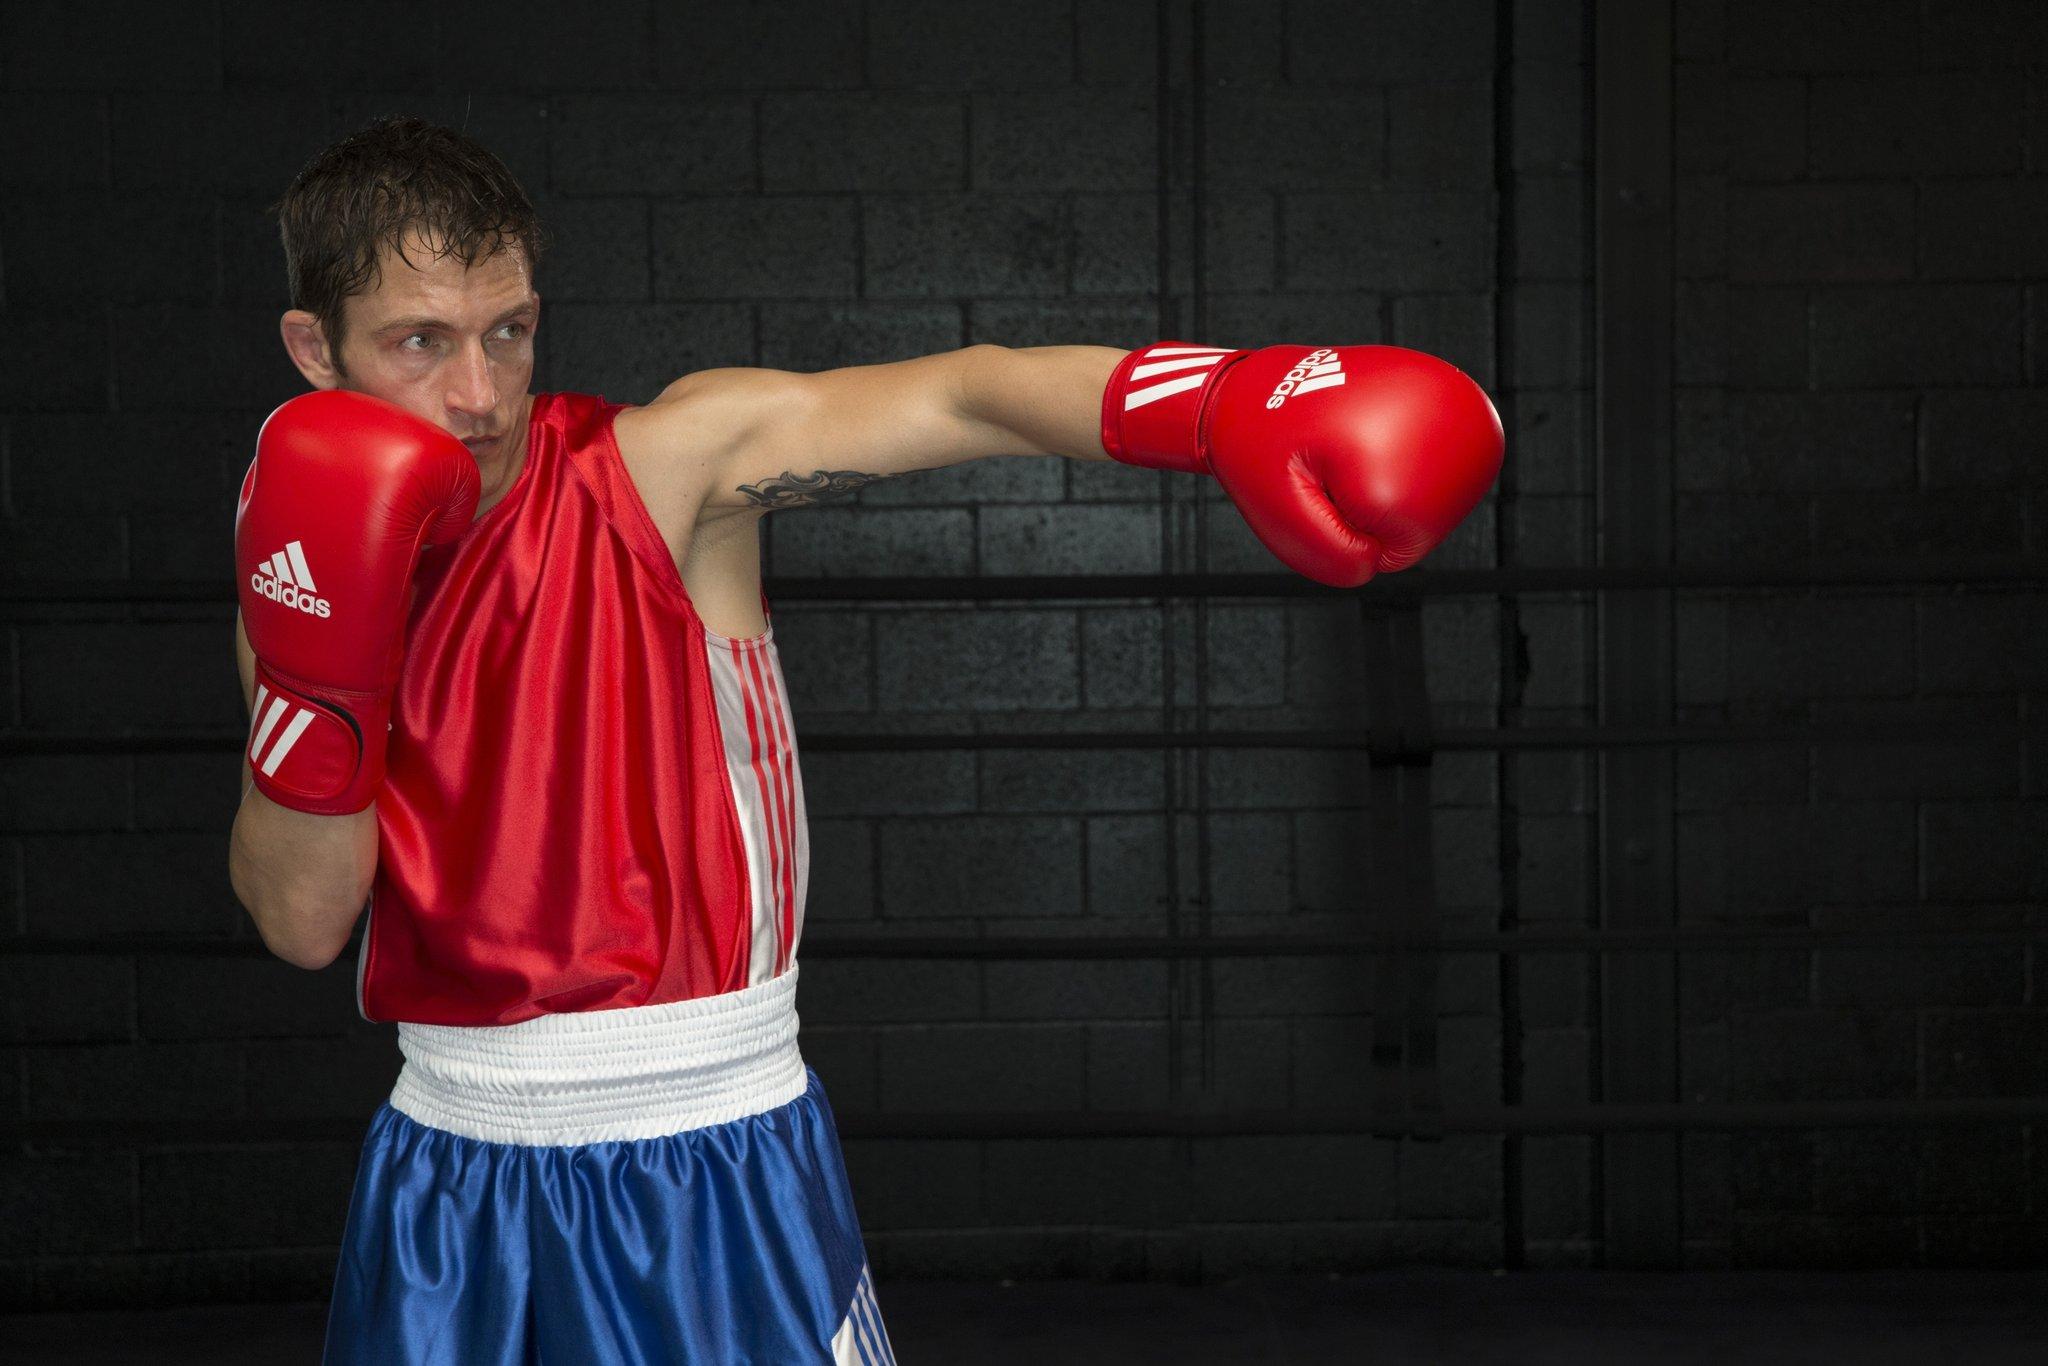 Дню учителя, картинки о боксе